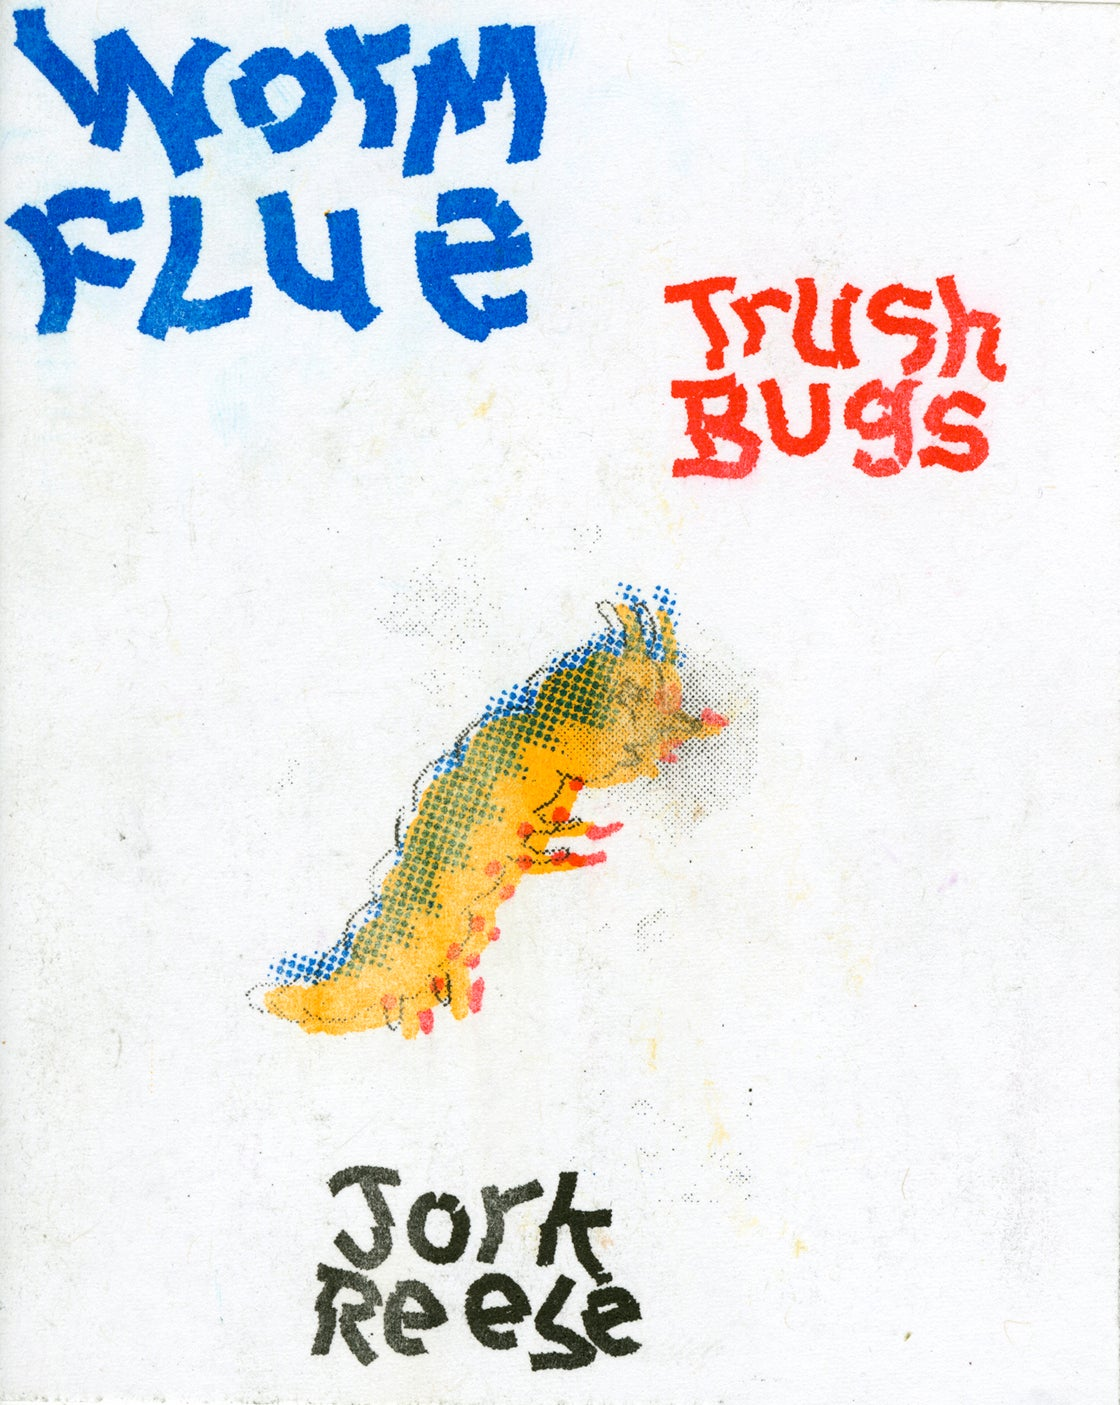 Image of WORM FLUE: TRUSH BUGS